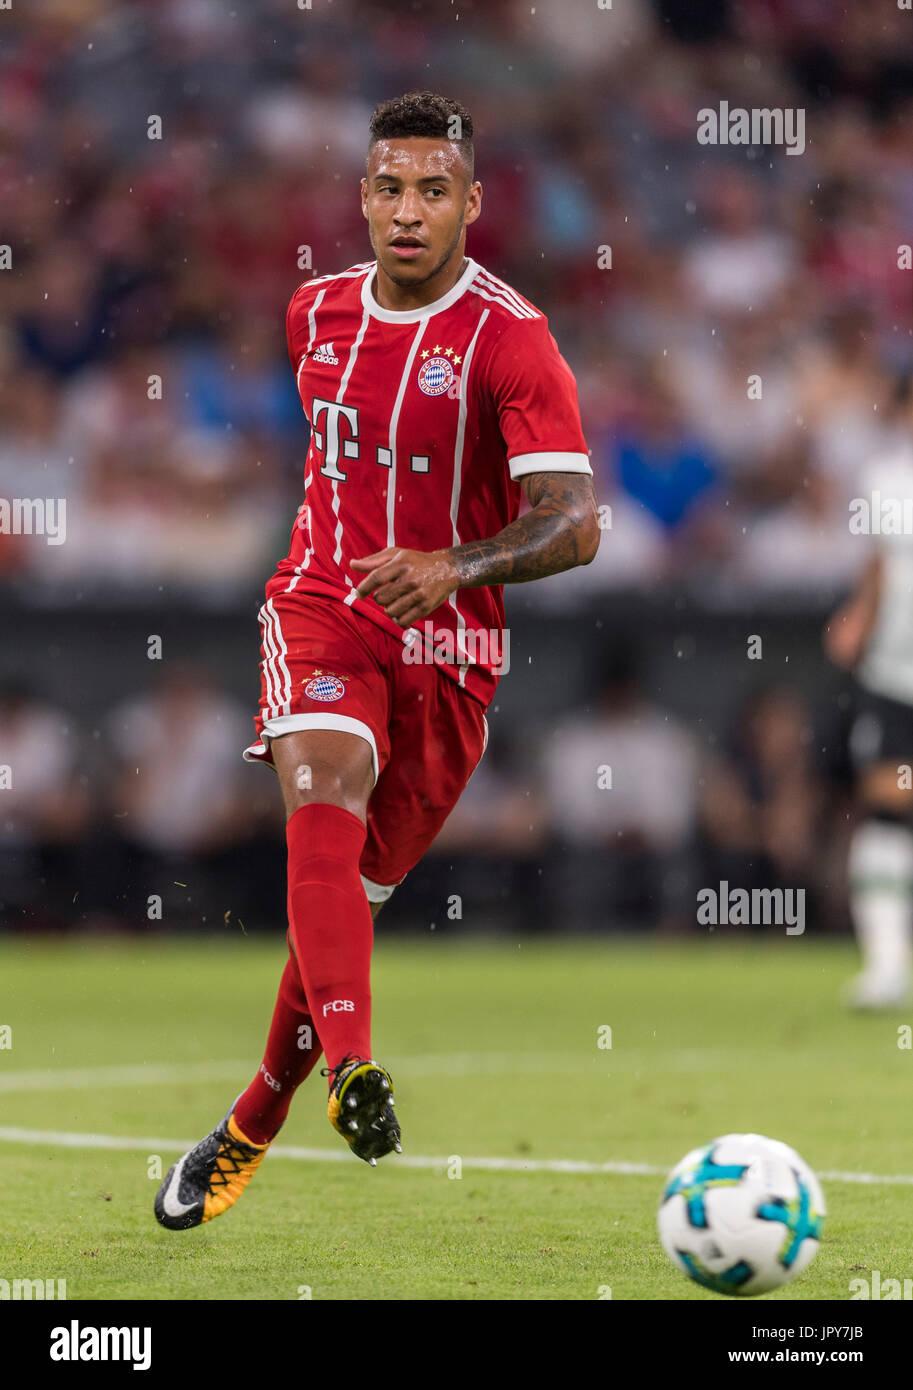 Corentin Tolisso Fc Bayern München High Resolution Stock ...